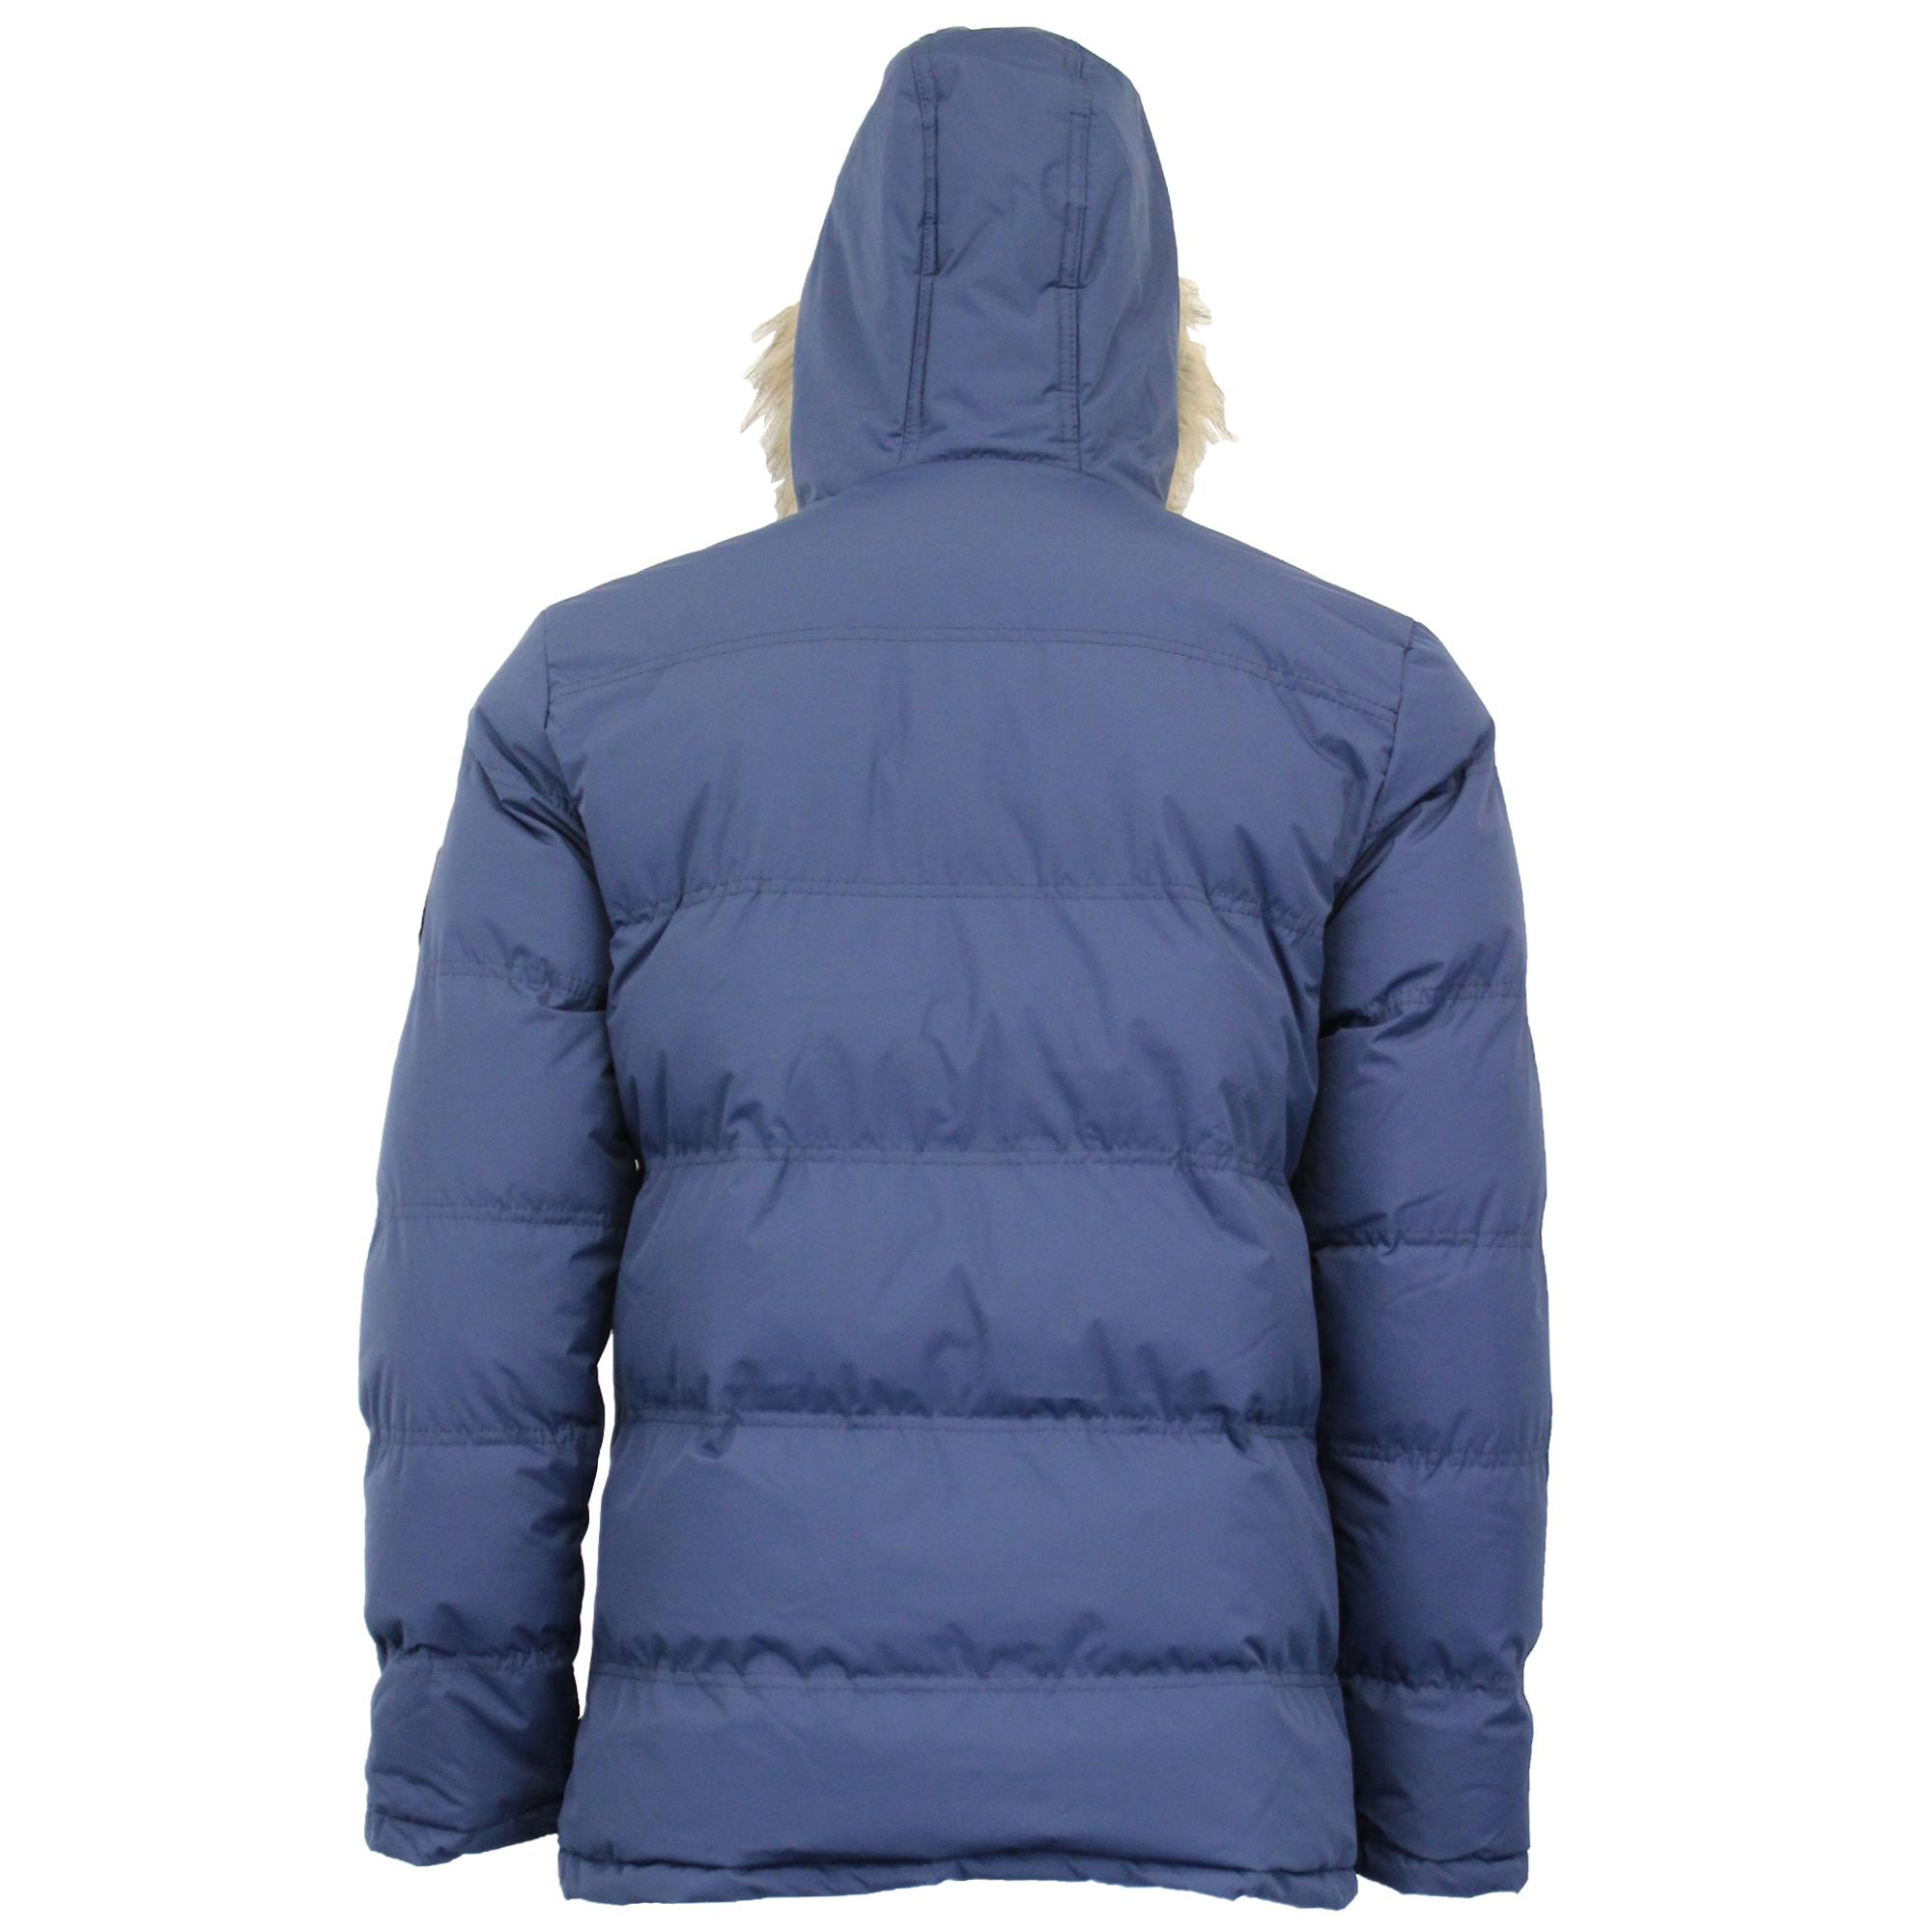 Mens Jacket Threadbare Coat Padded Quilted Hoodie RUNCORN Fur Zip Lined Winter